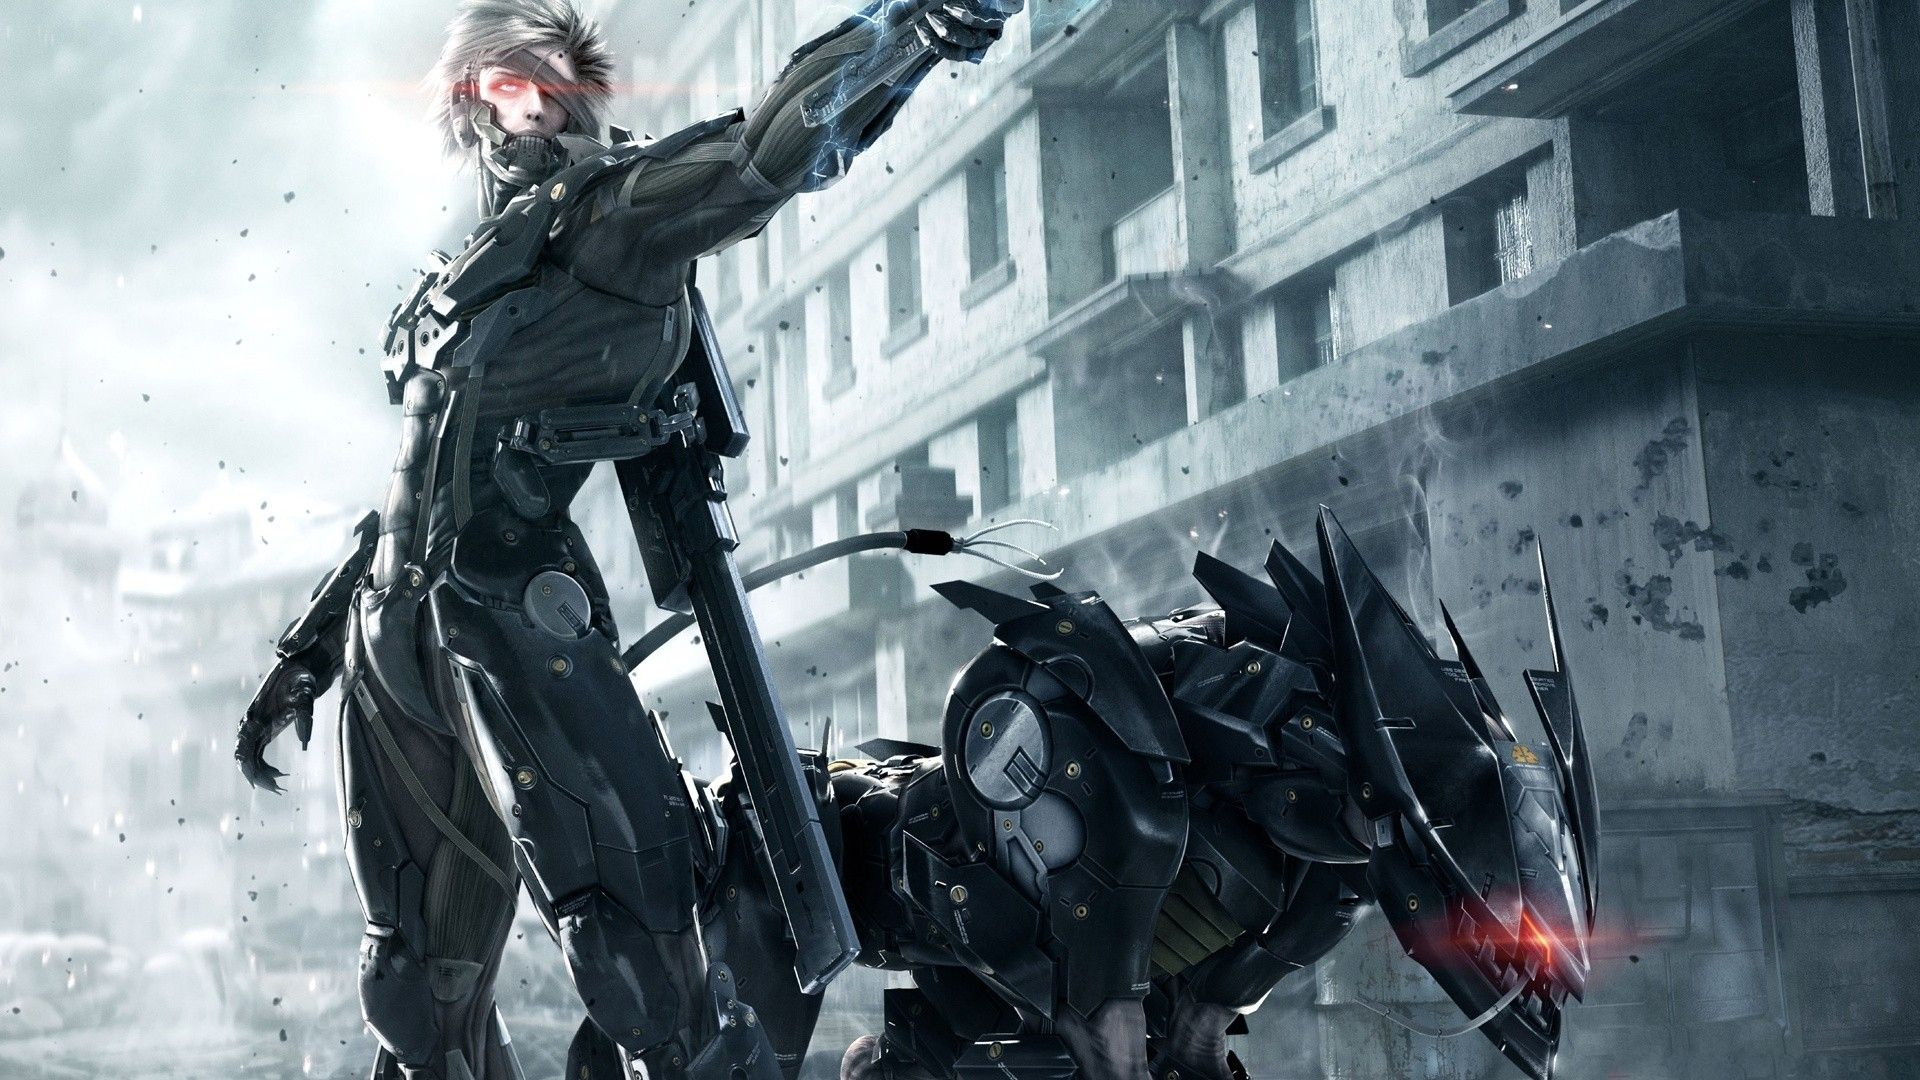 Metal Gear Rising Machine Robot Wallpaper 1920x1080 78832